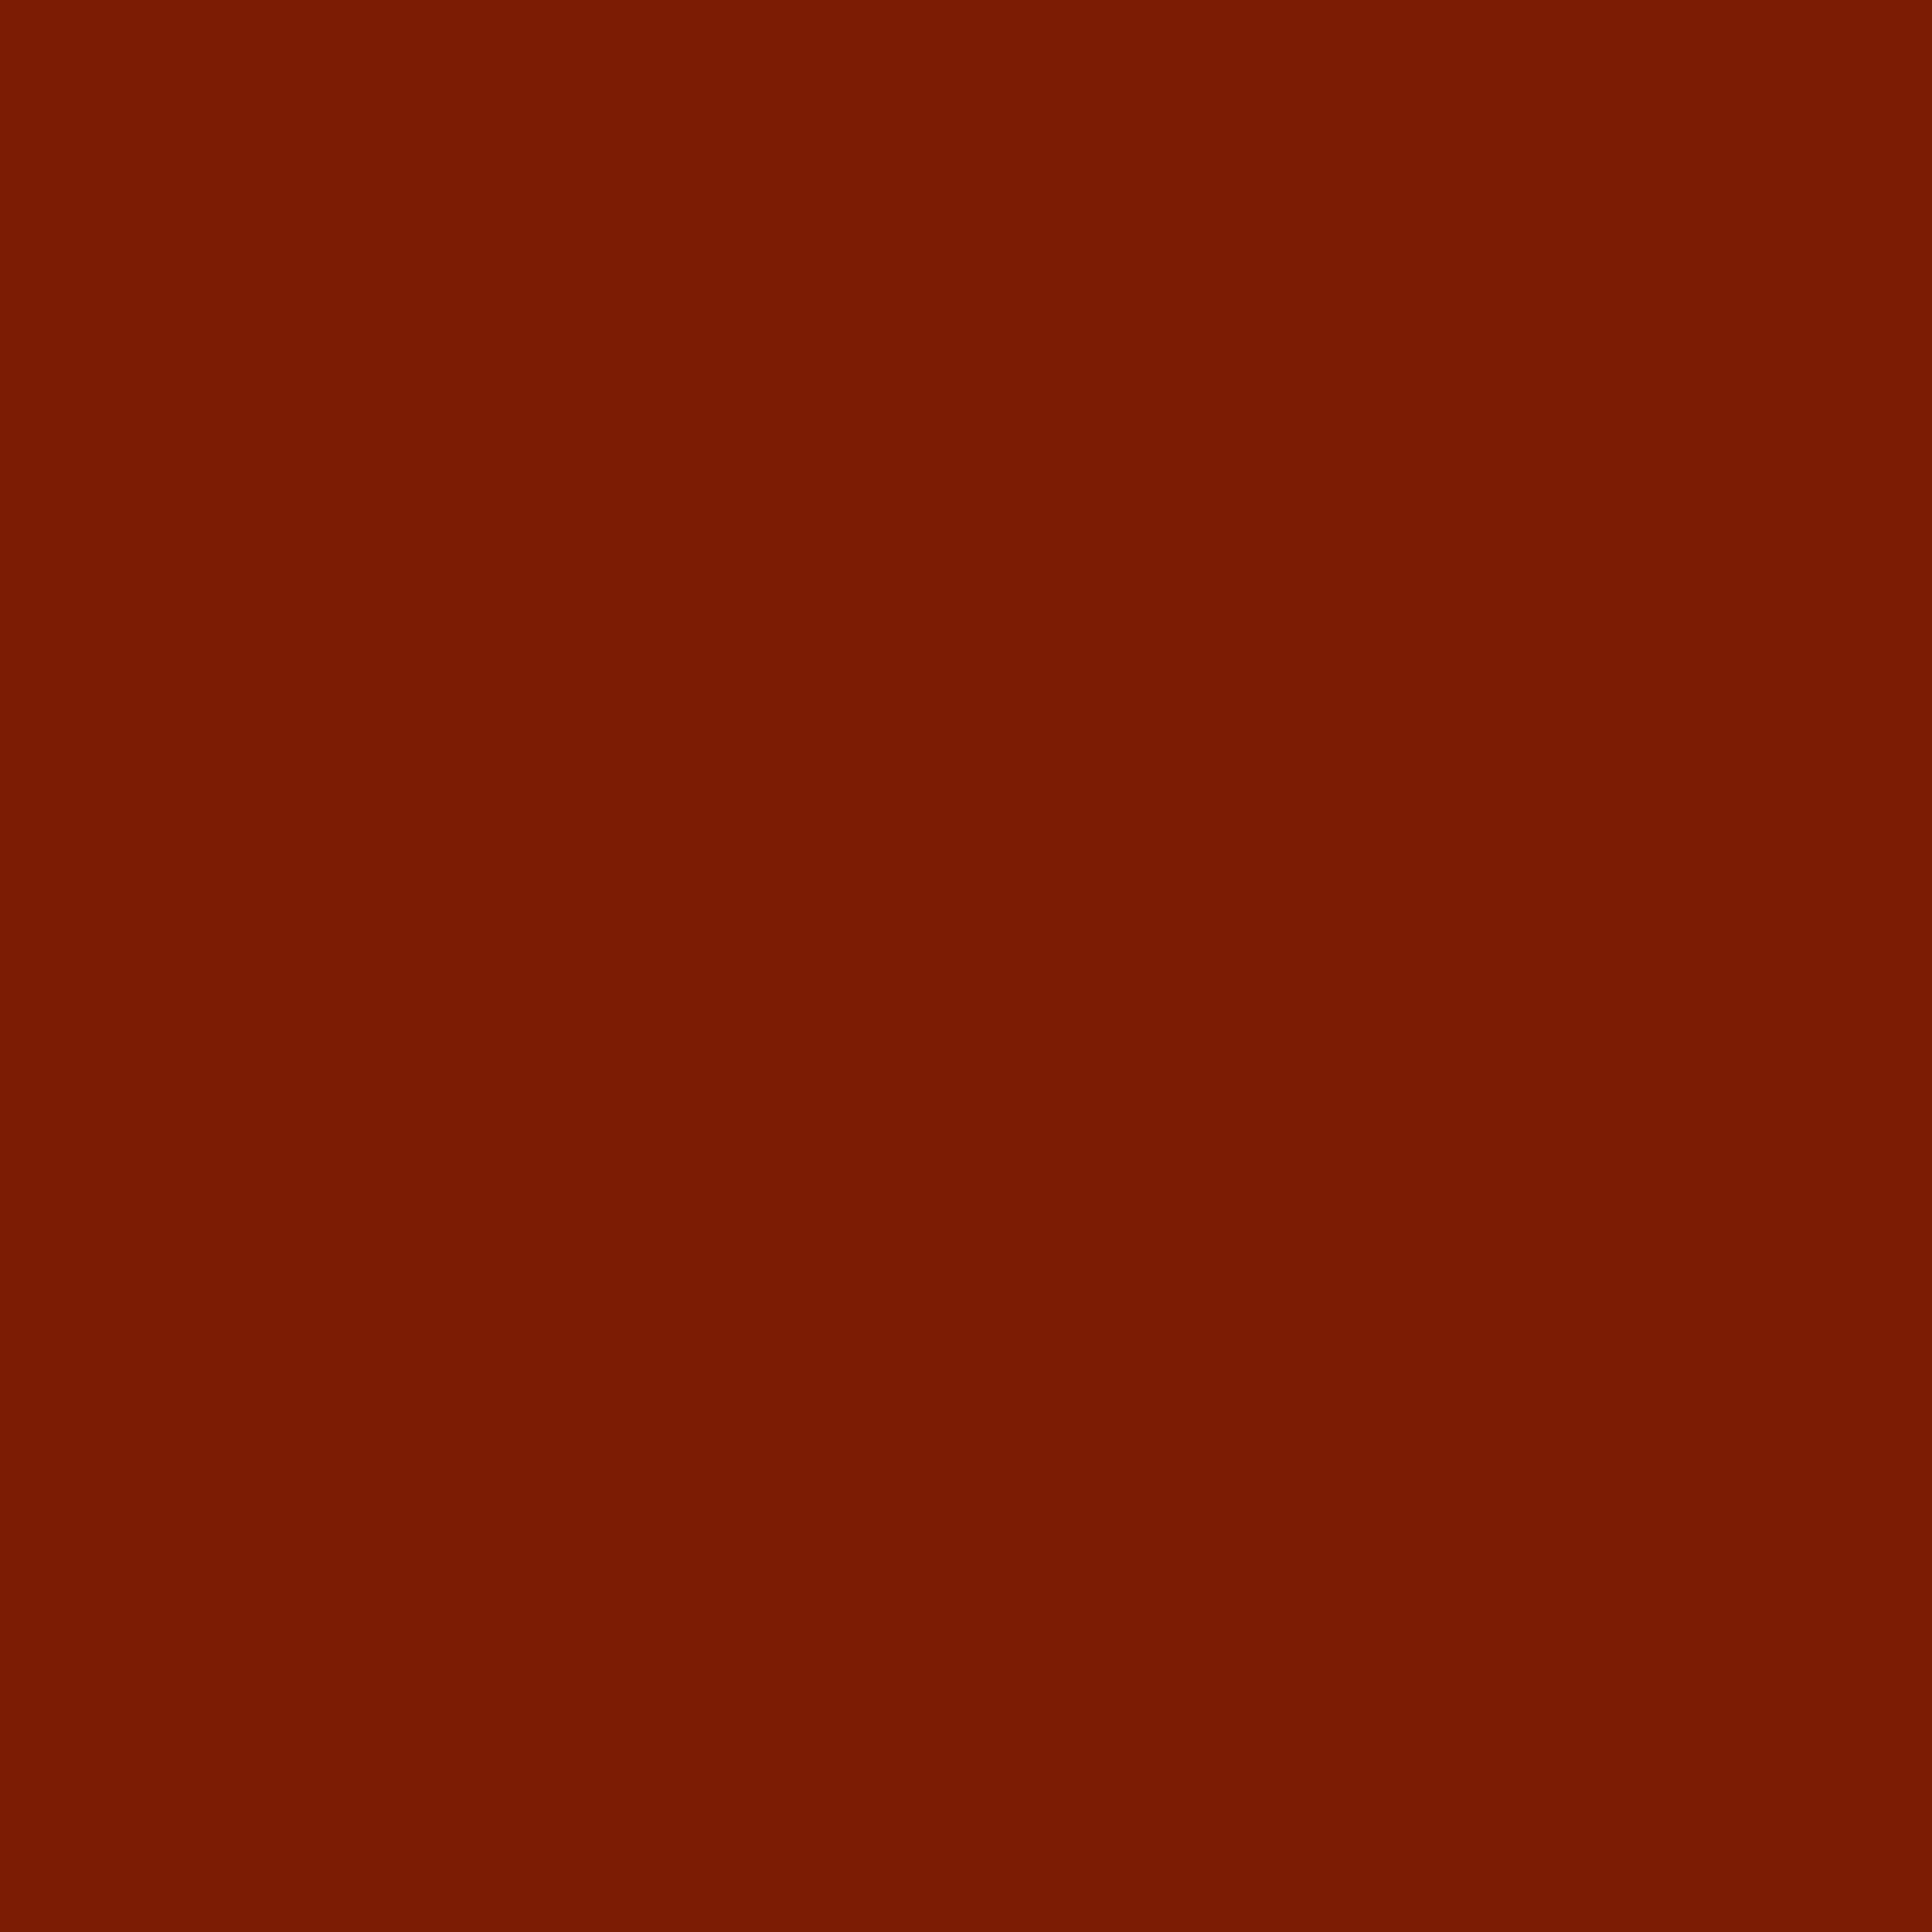 2732x2732 Kenyan Copper Solid Color Background